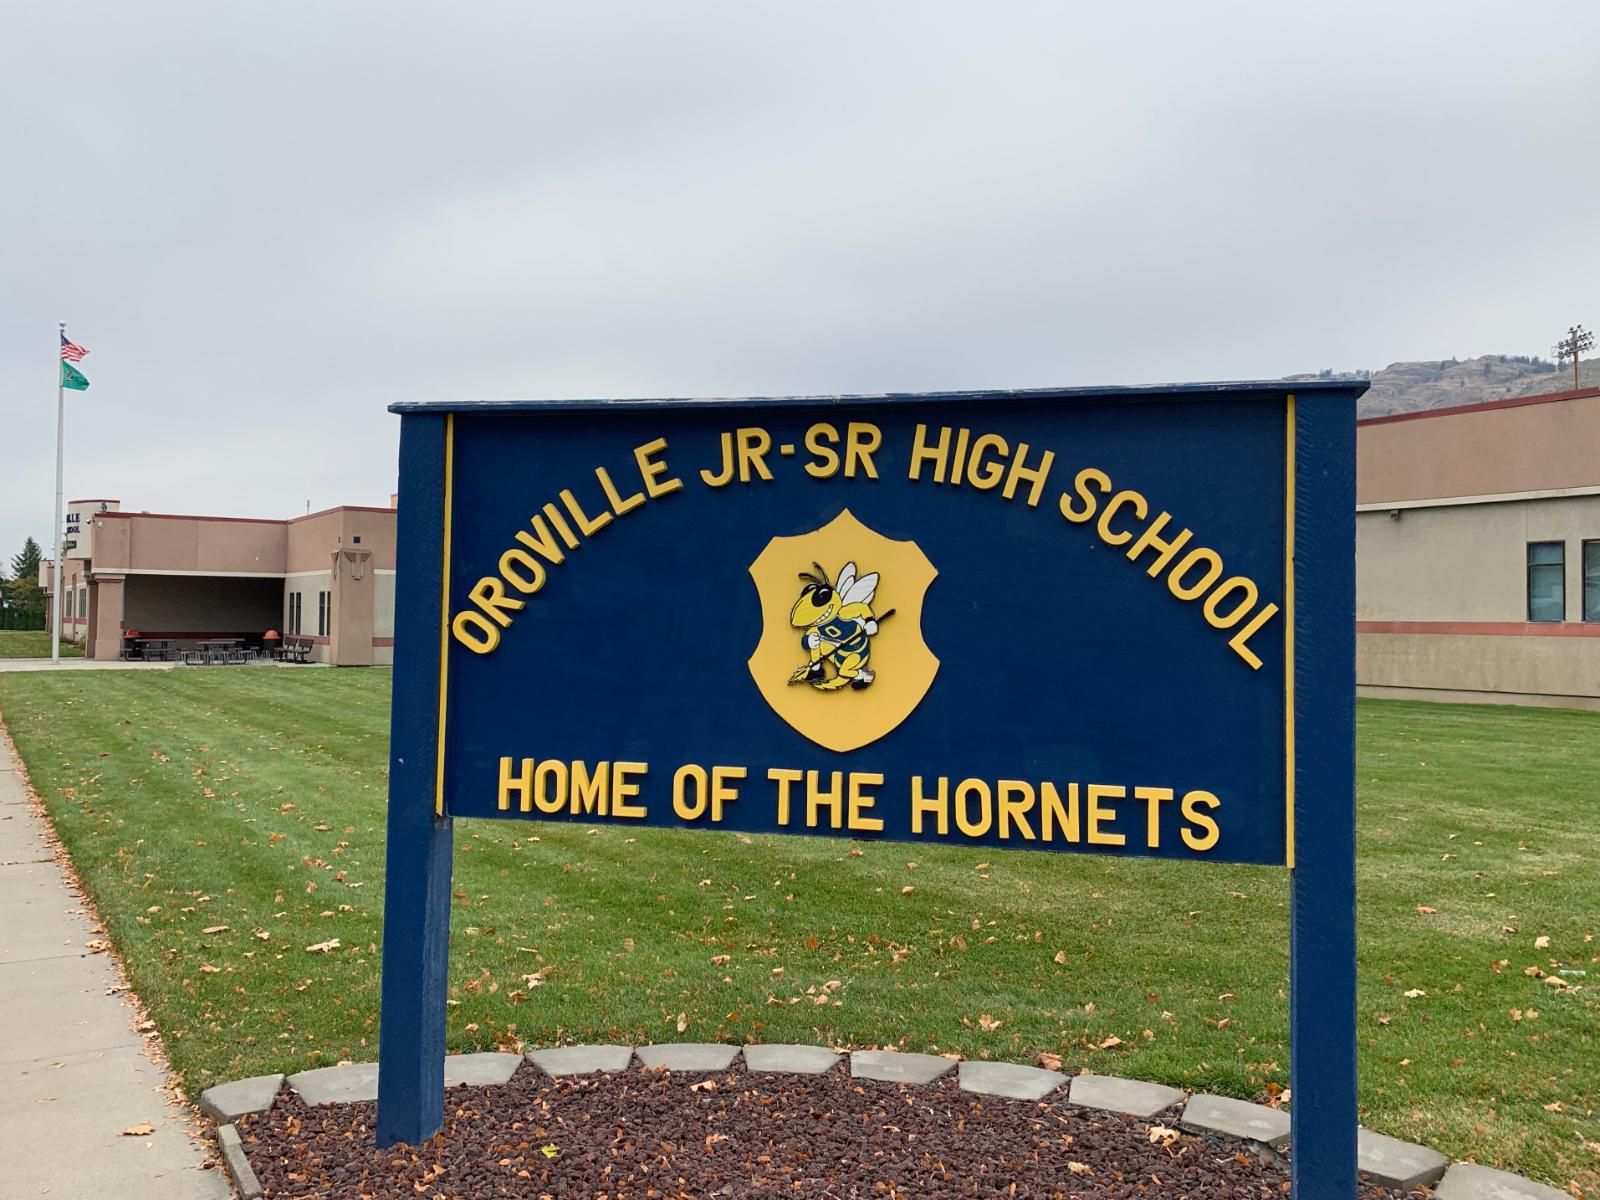 Oroville Jr/Sr High School